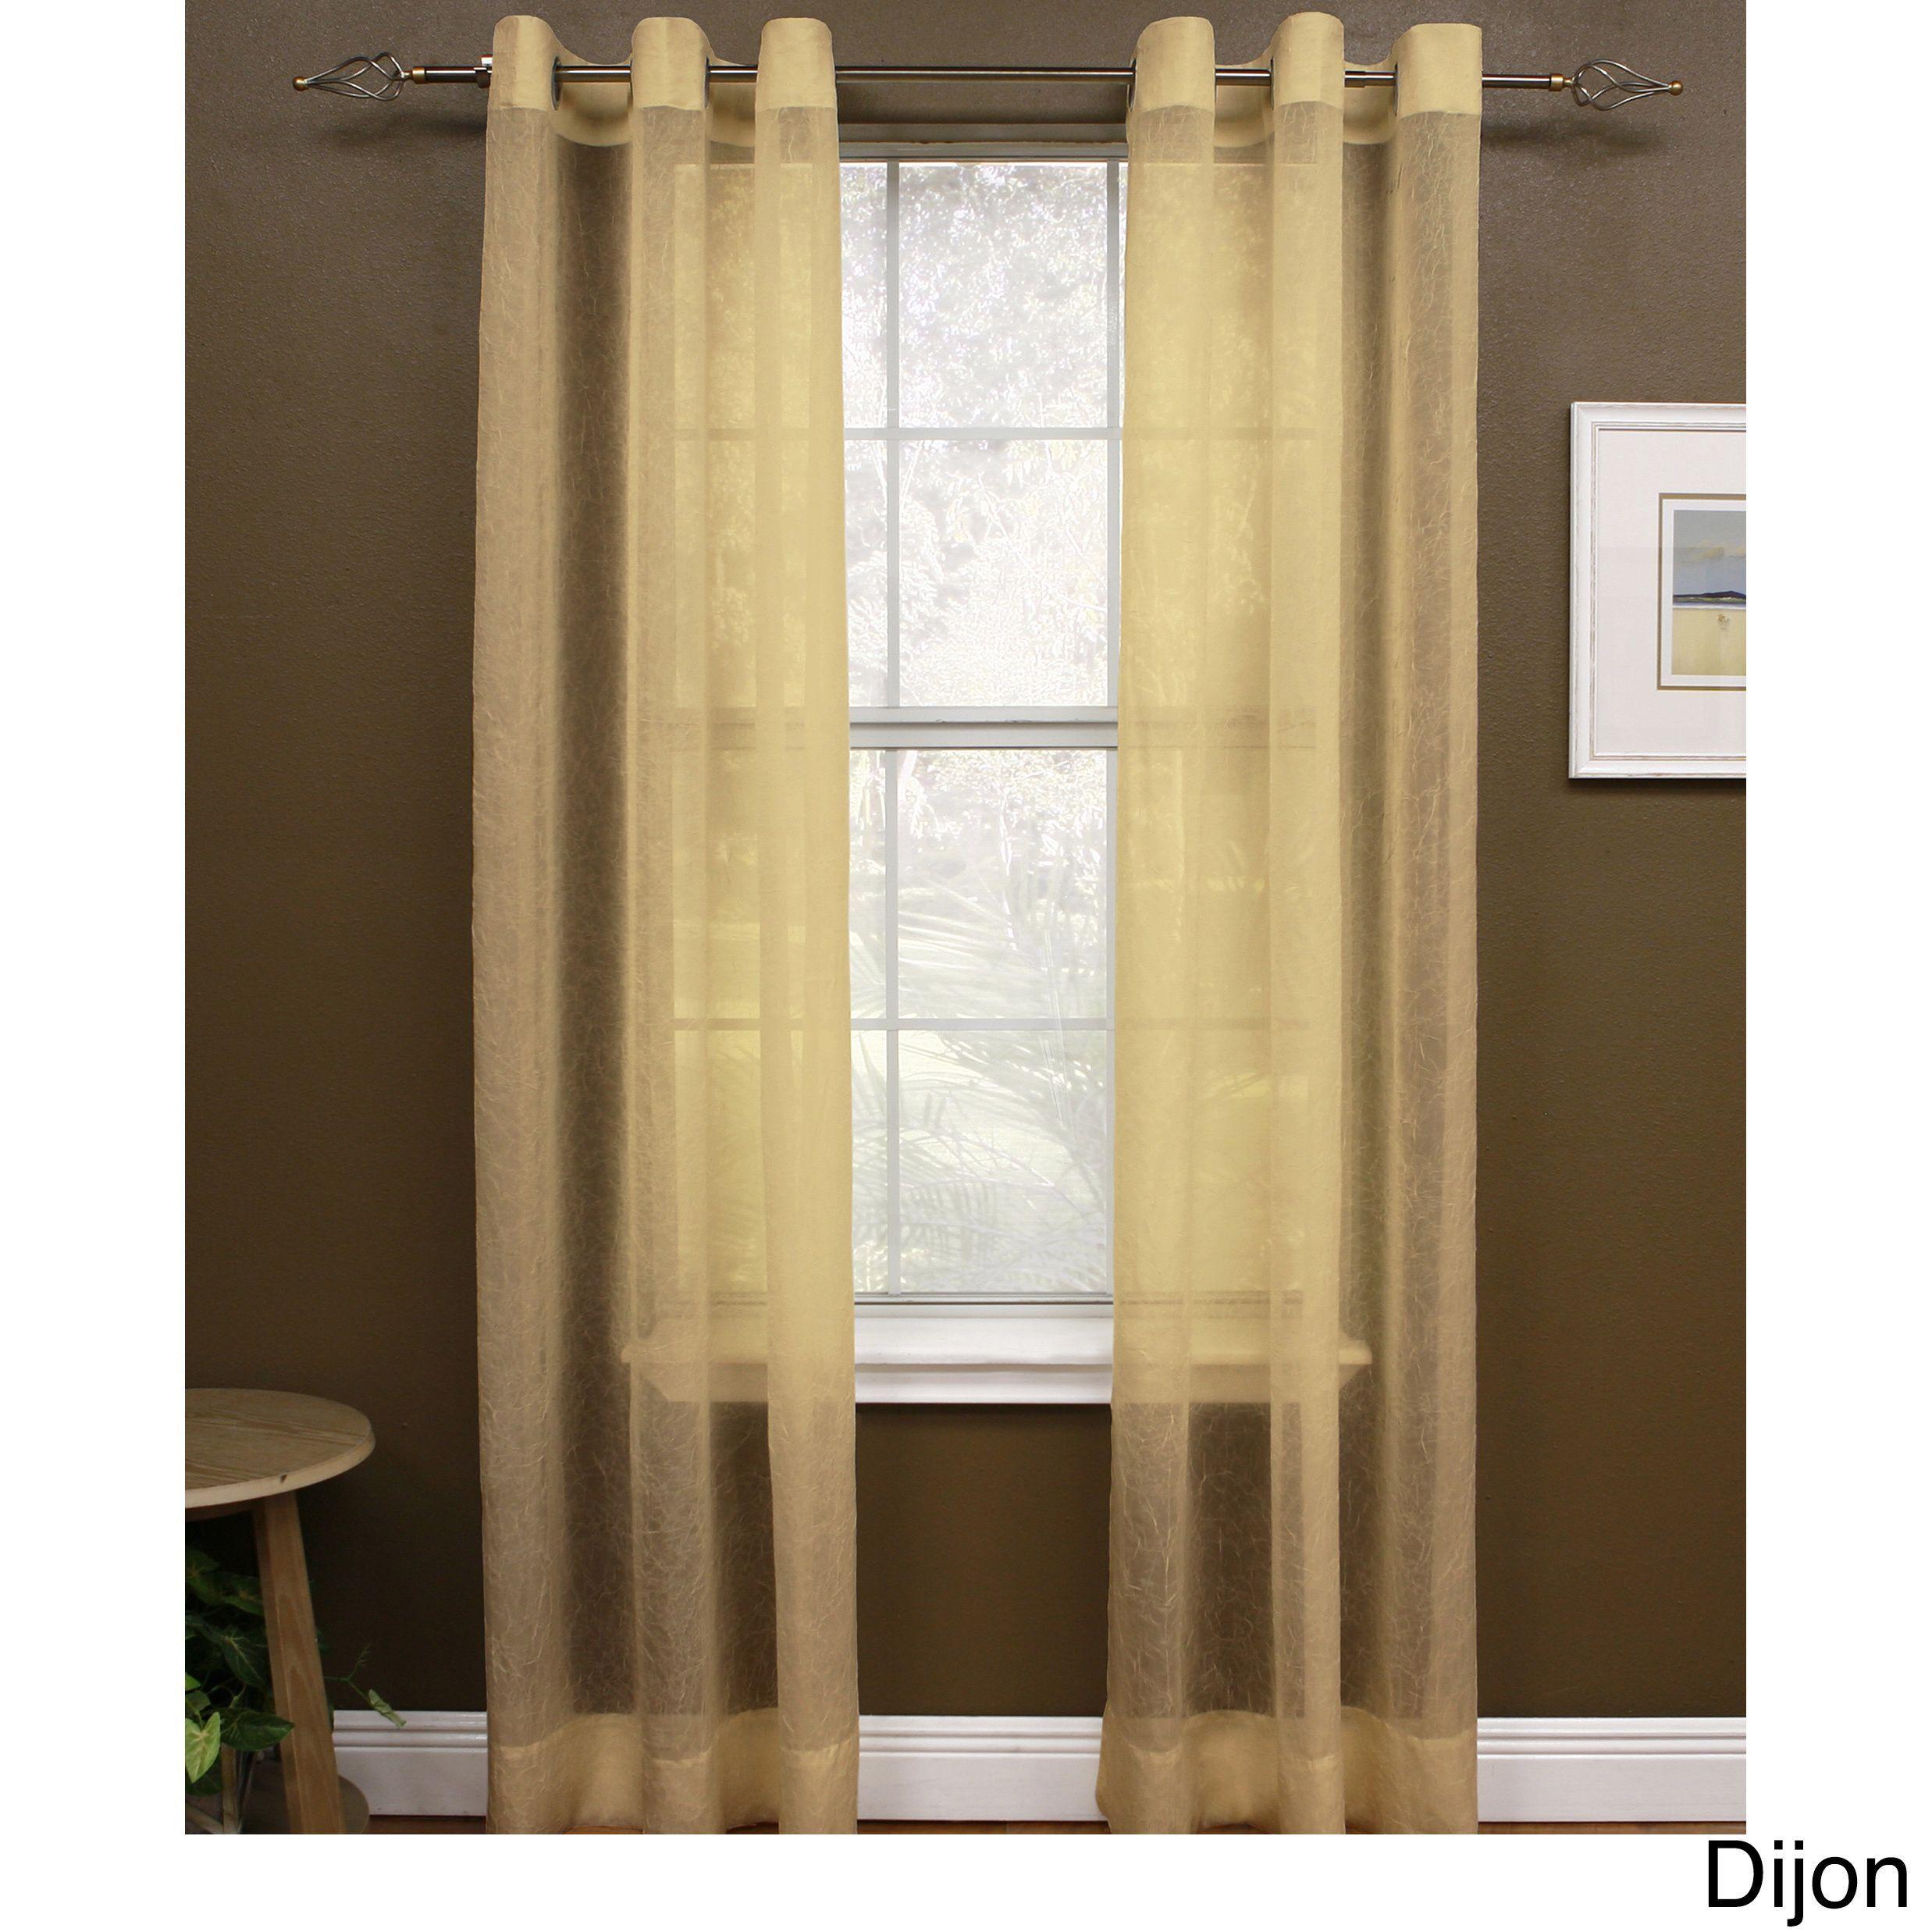 Miller Curtains 95 Inch Preston Grommet Sheer Panel 48 X 95 Brown Curtains 1 Panel Curtains Insulated Curtains